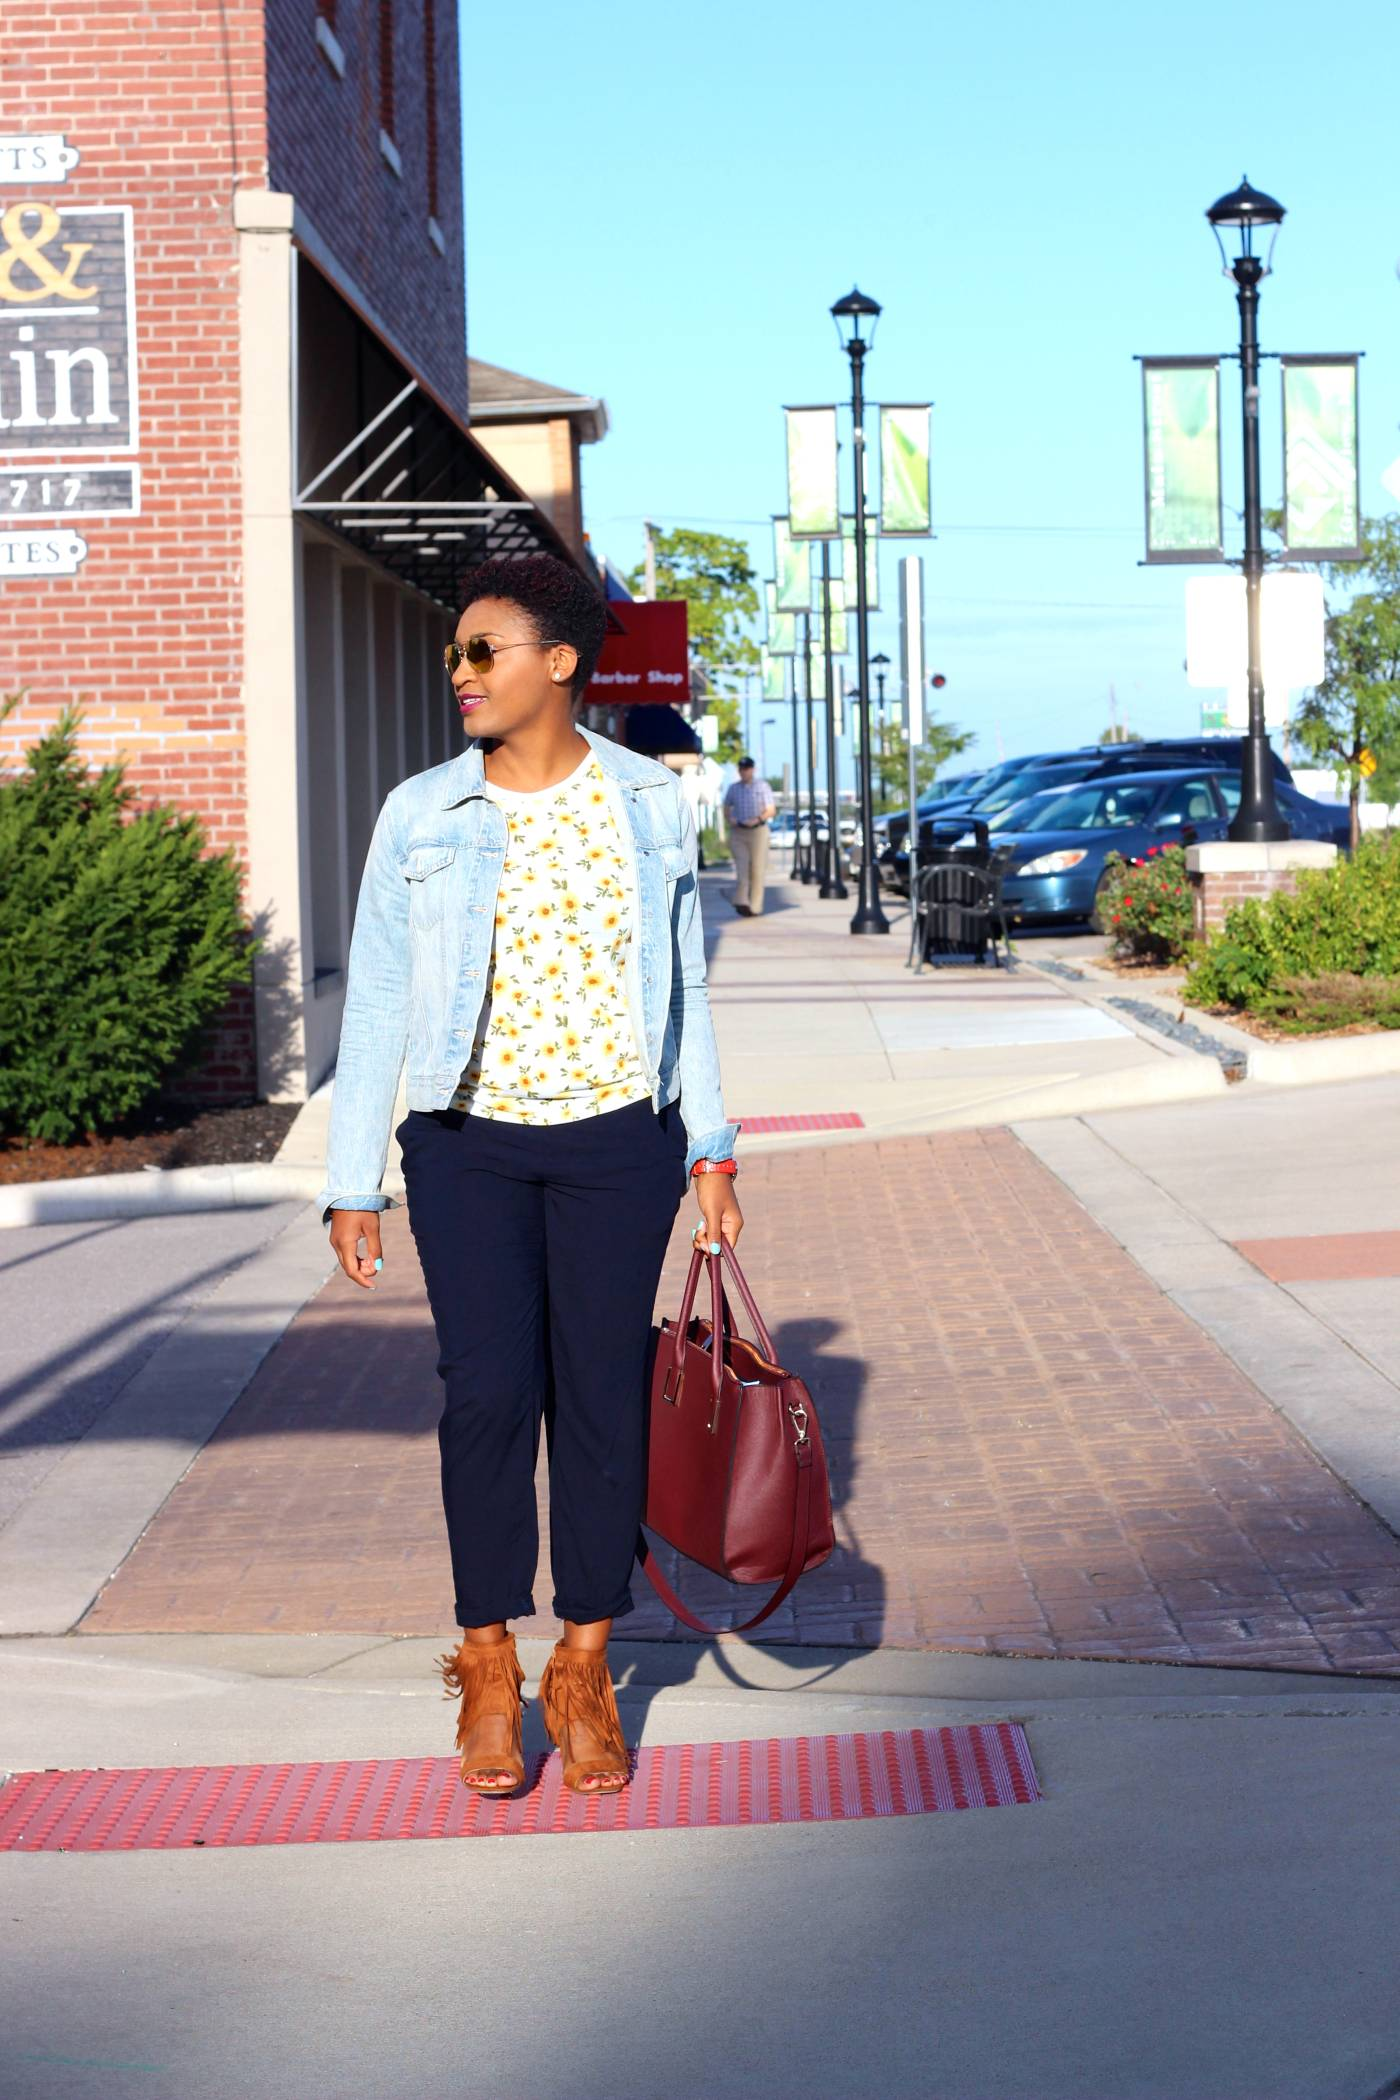 Jasmine Diane. Kansas City. Fall fashion. Flower tee, trousers and GAP denim jacket. Black blogger.